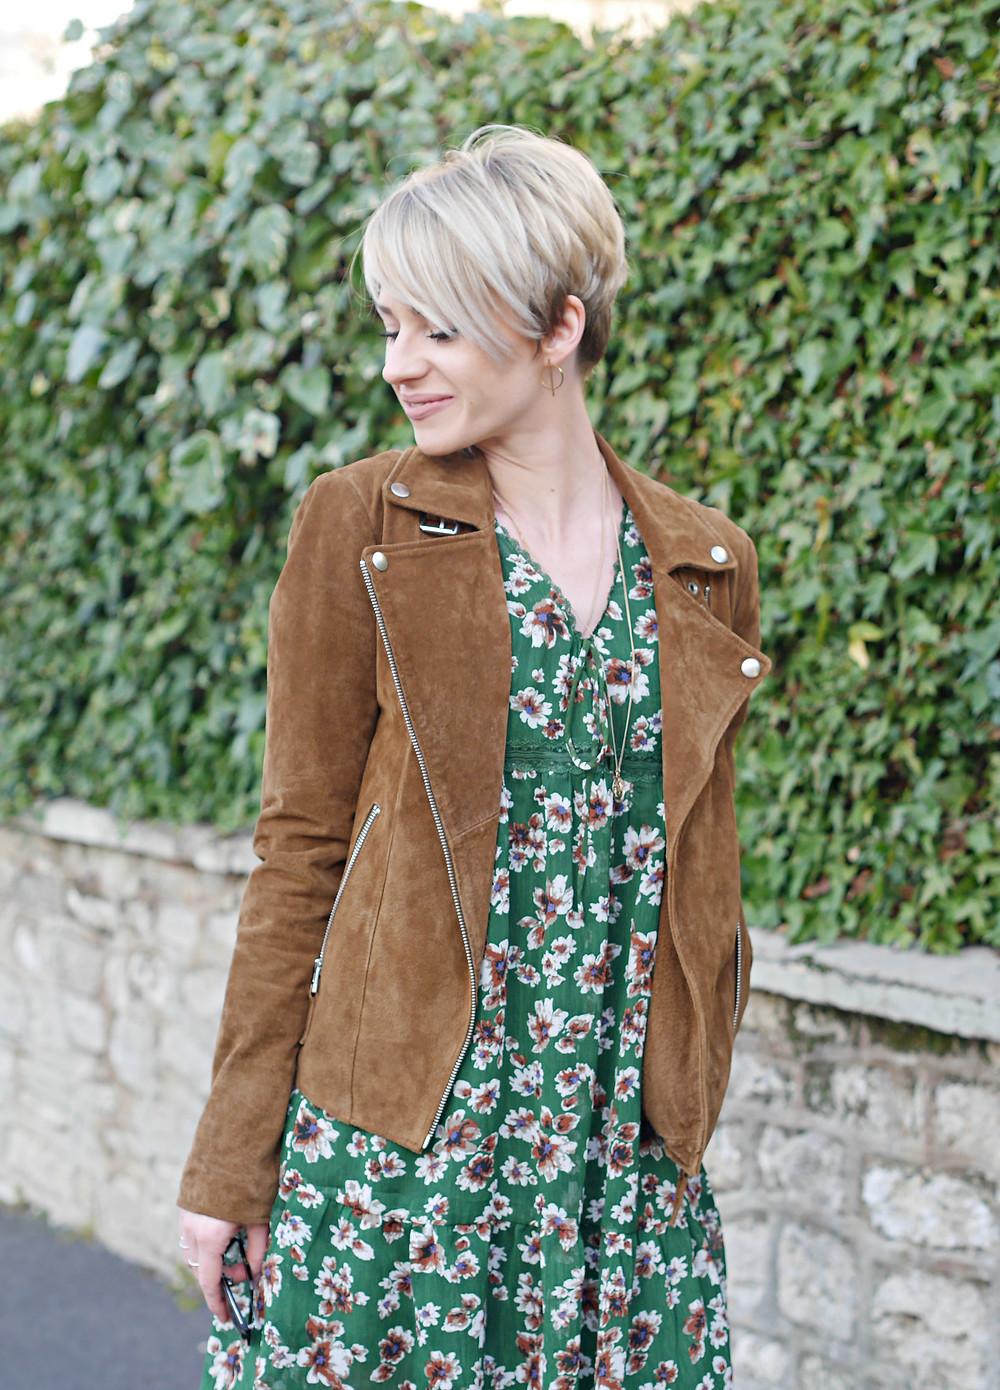 blog mode idée de look printemps spring caen normandie